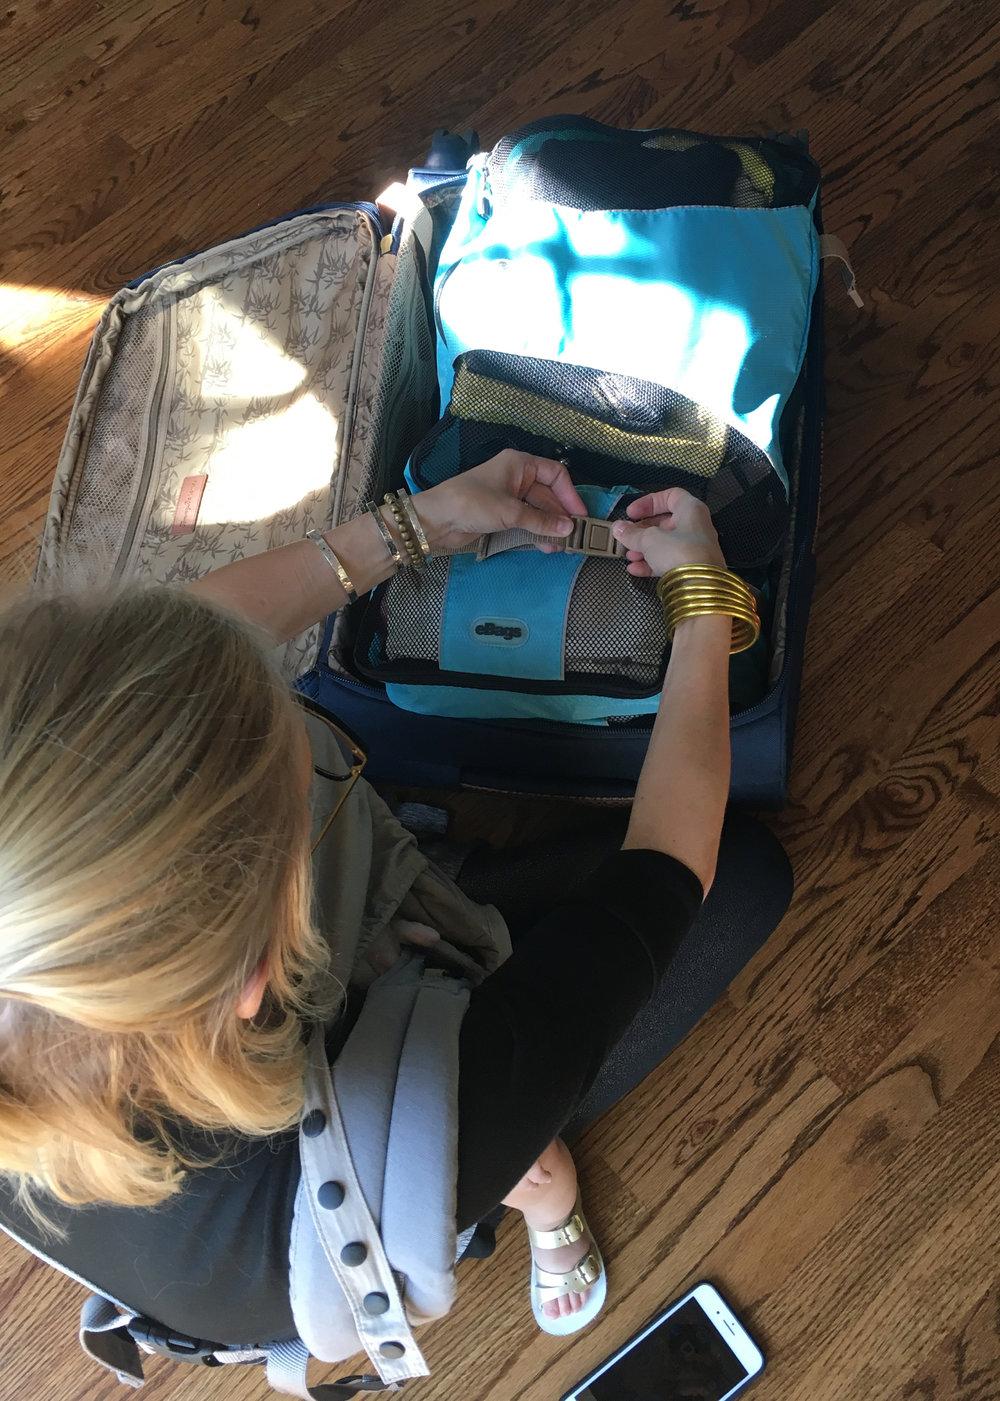 packing snapping hooks.JPG